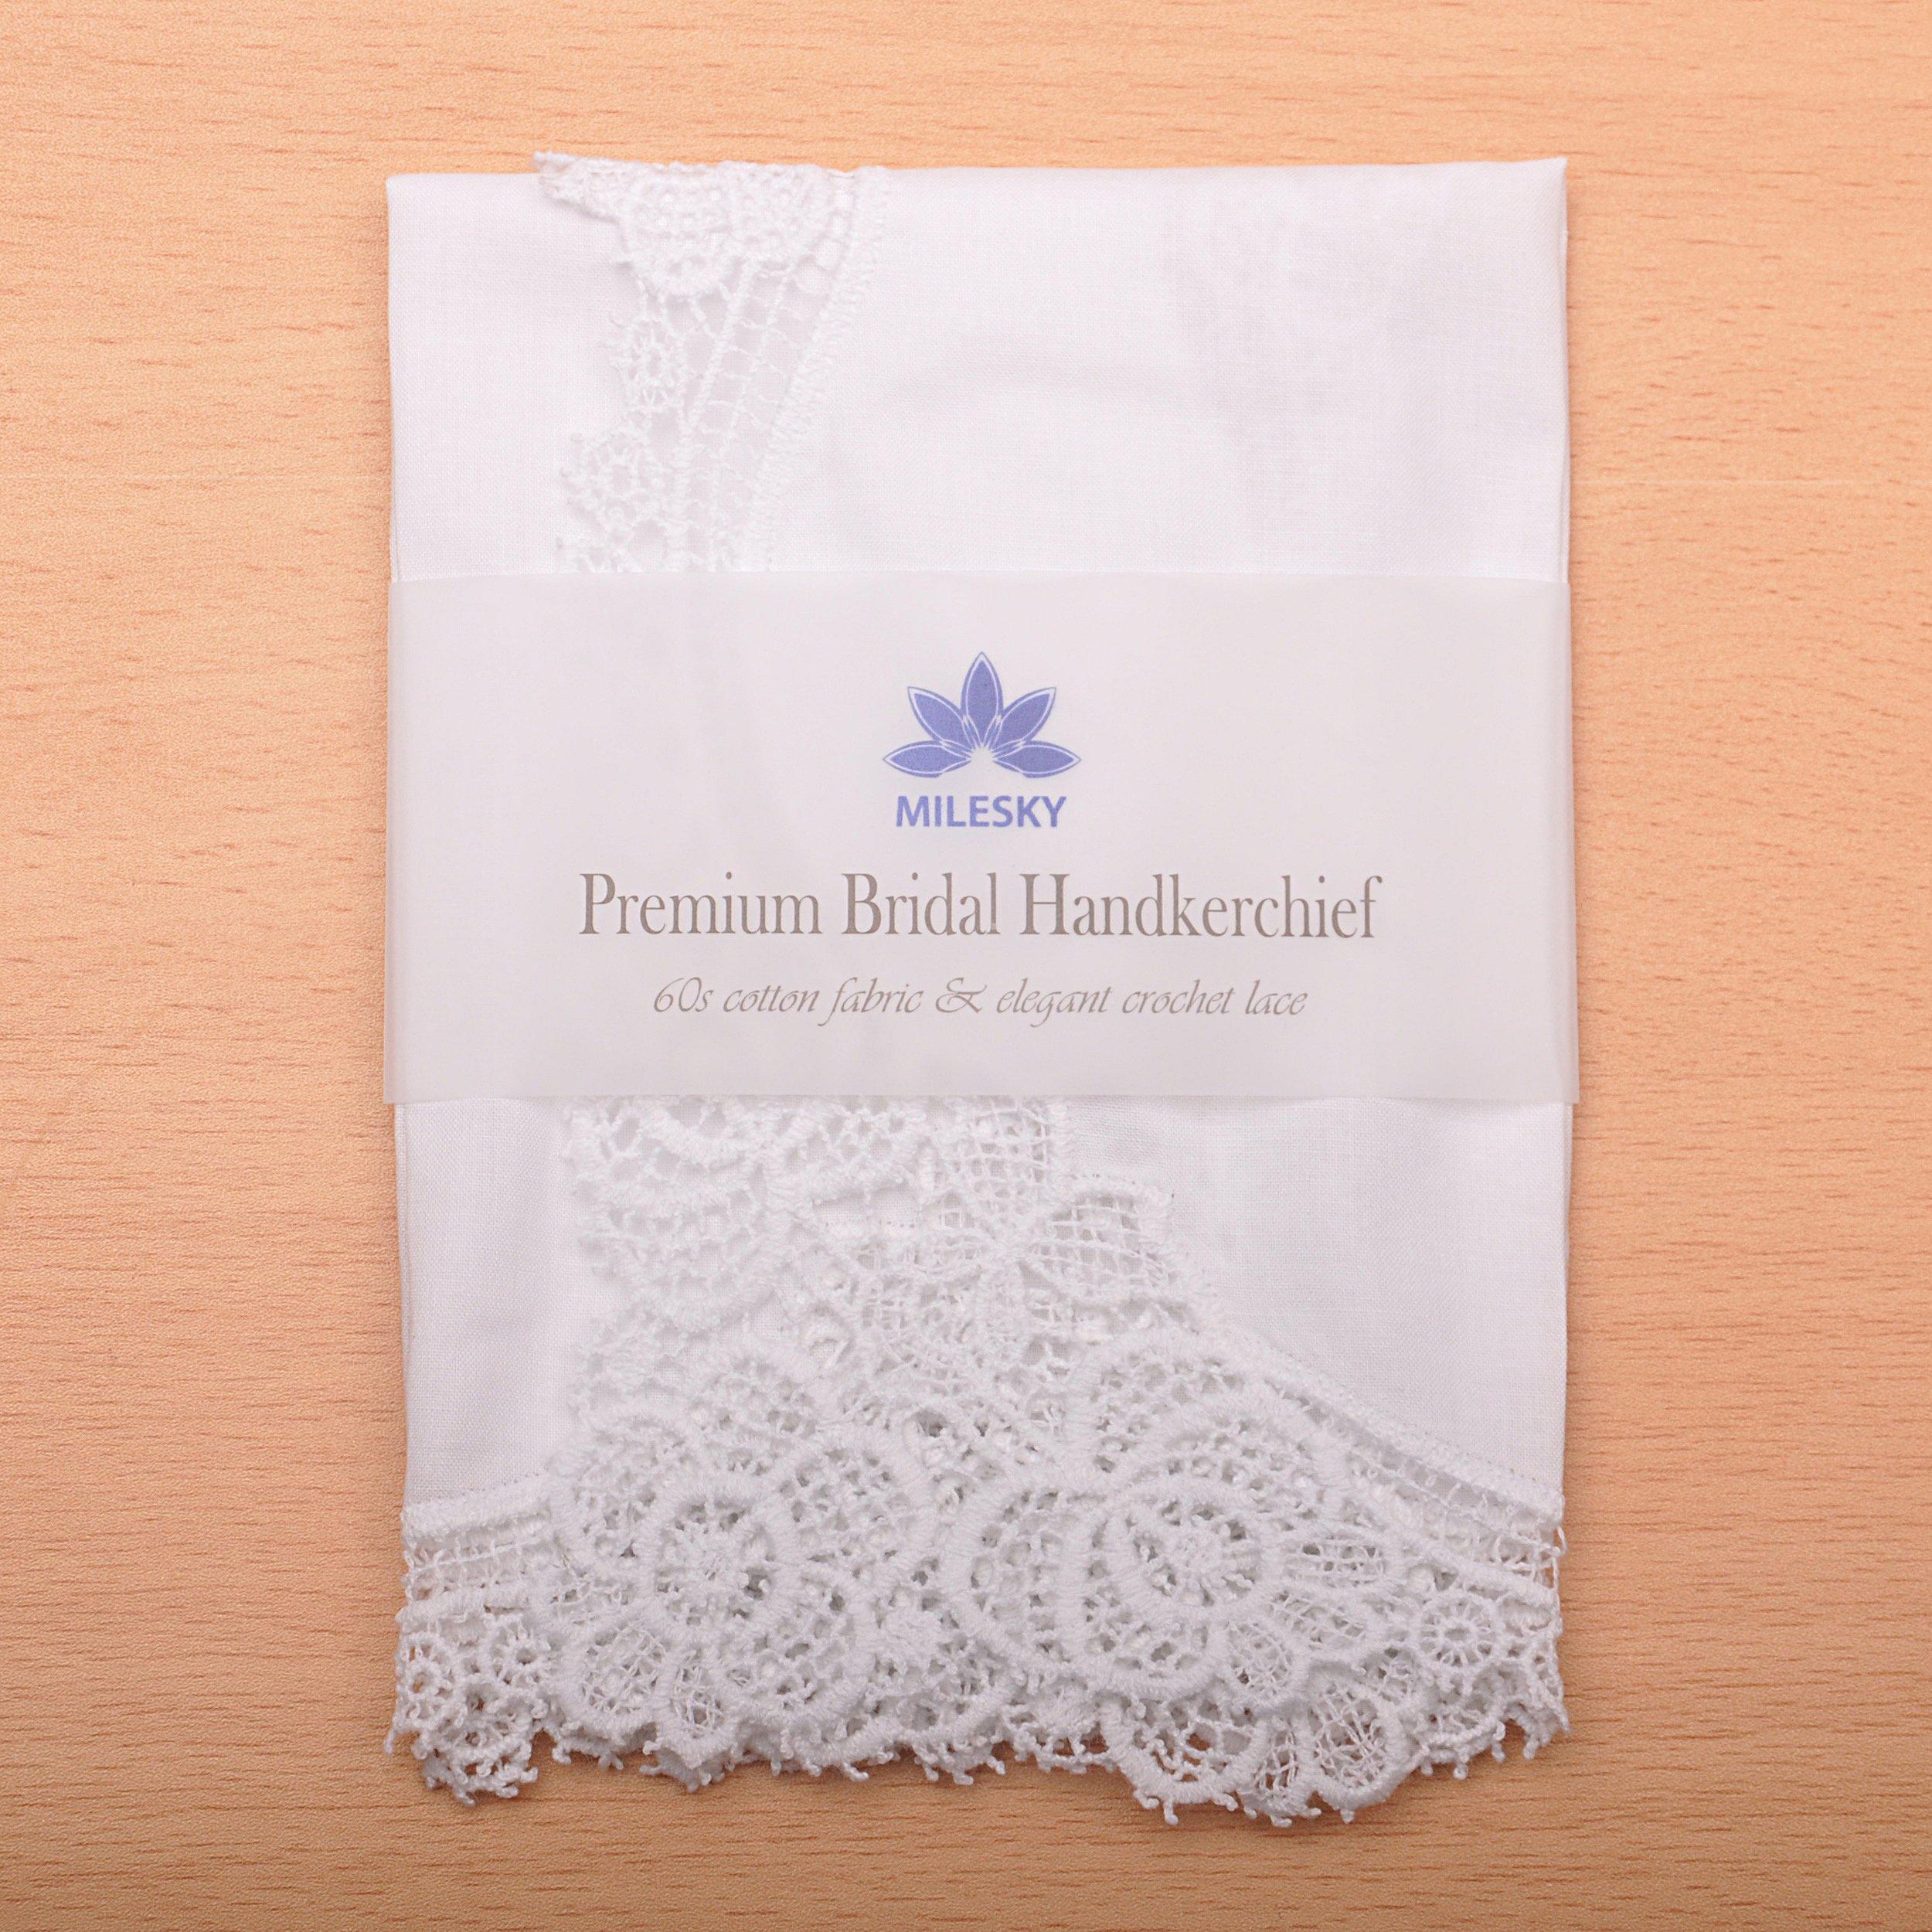 Milesky Bridal Wedding Crochet Lace Handkerchief Premium 60S Cotton CH02 by Milesky (Image #6)